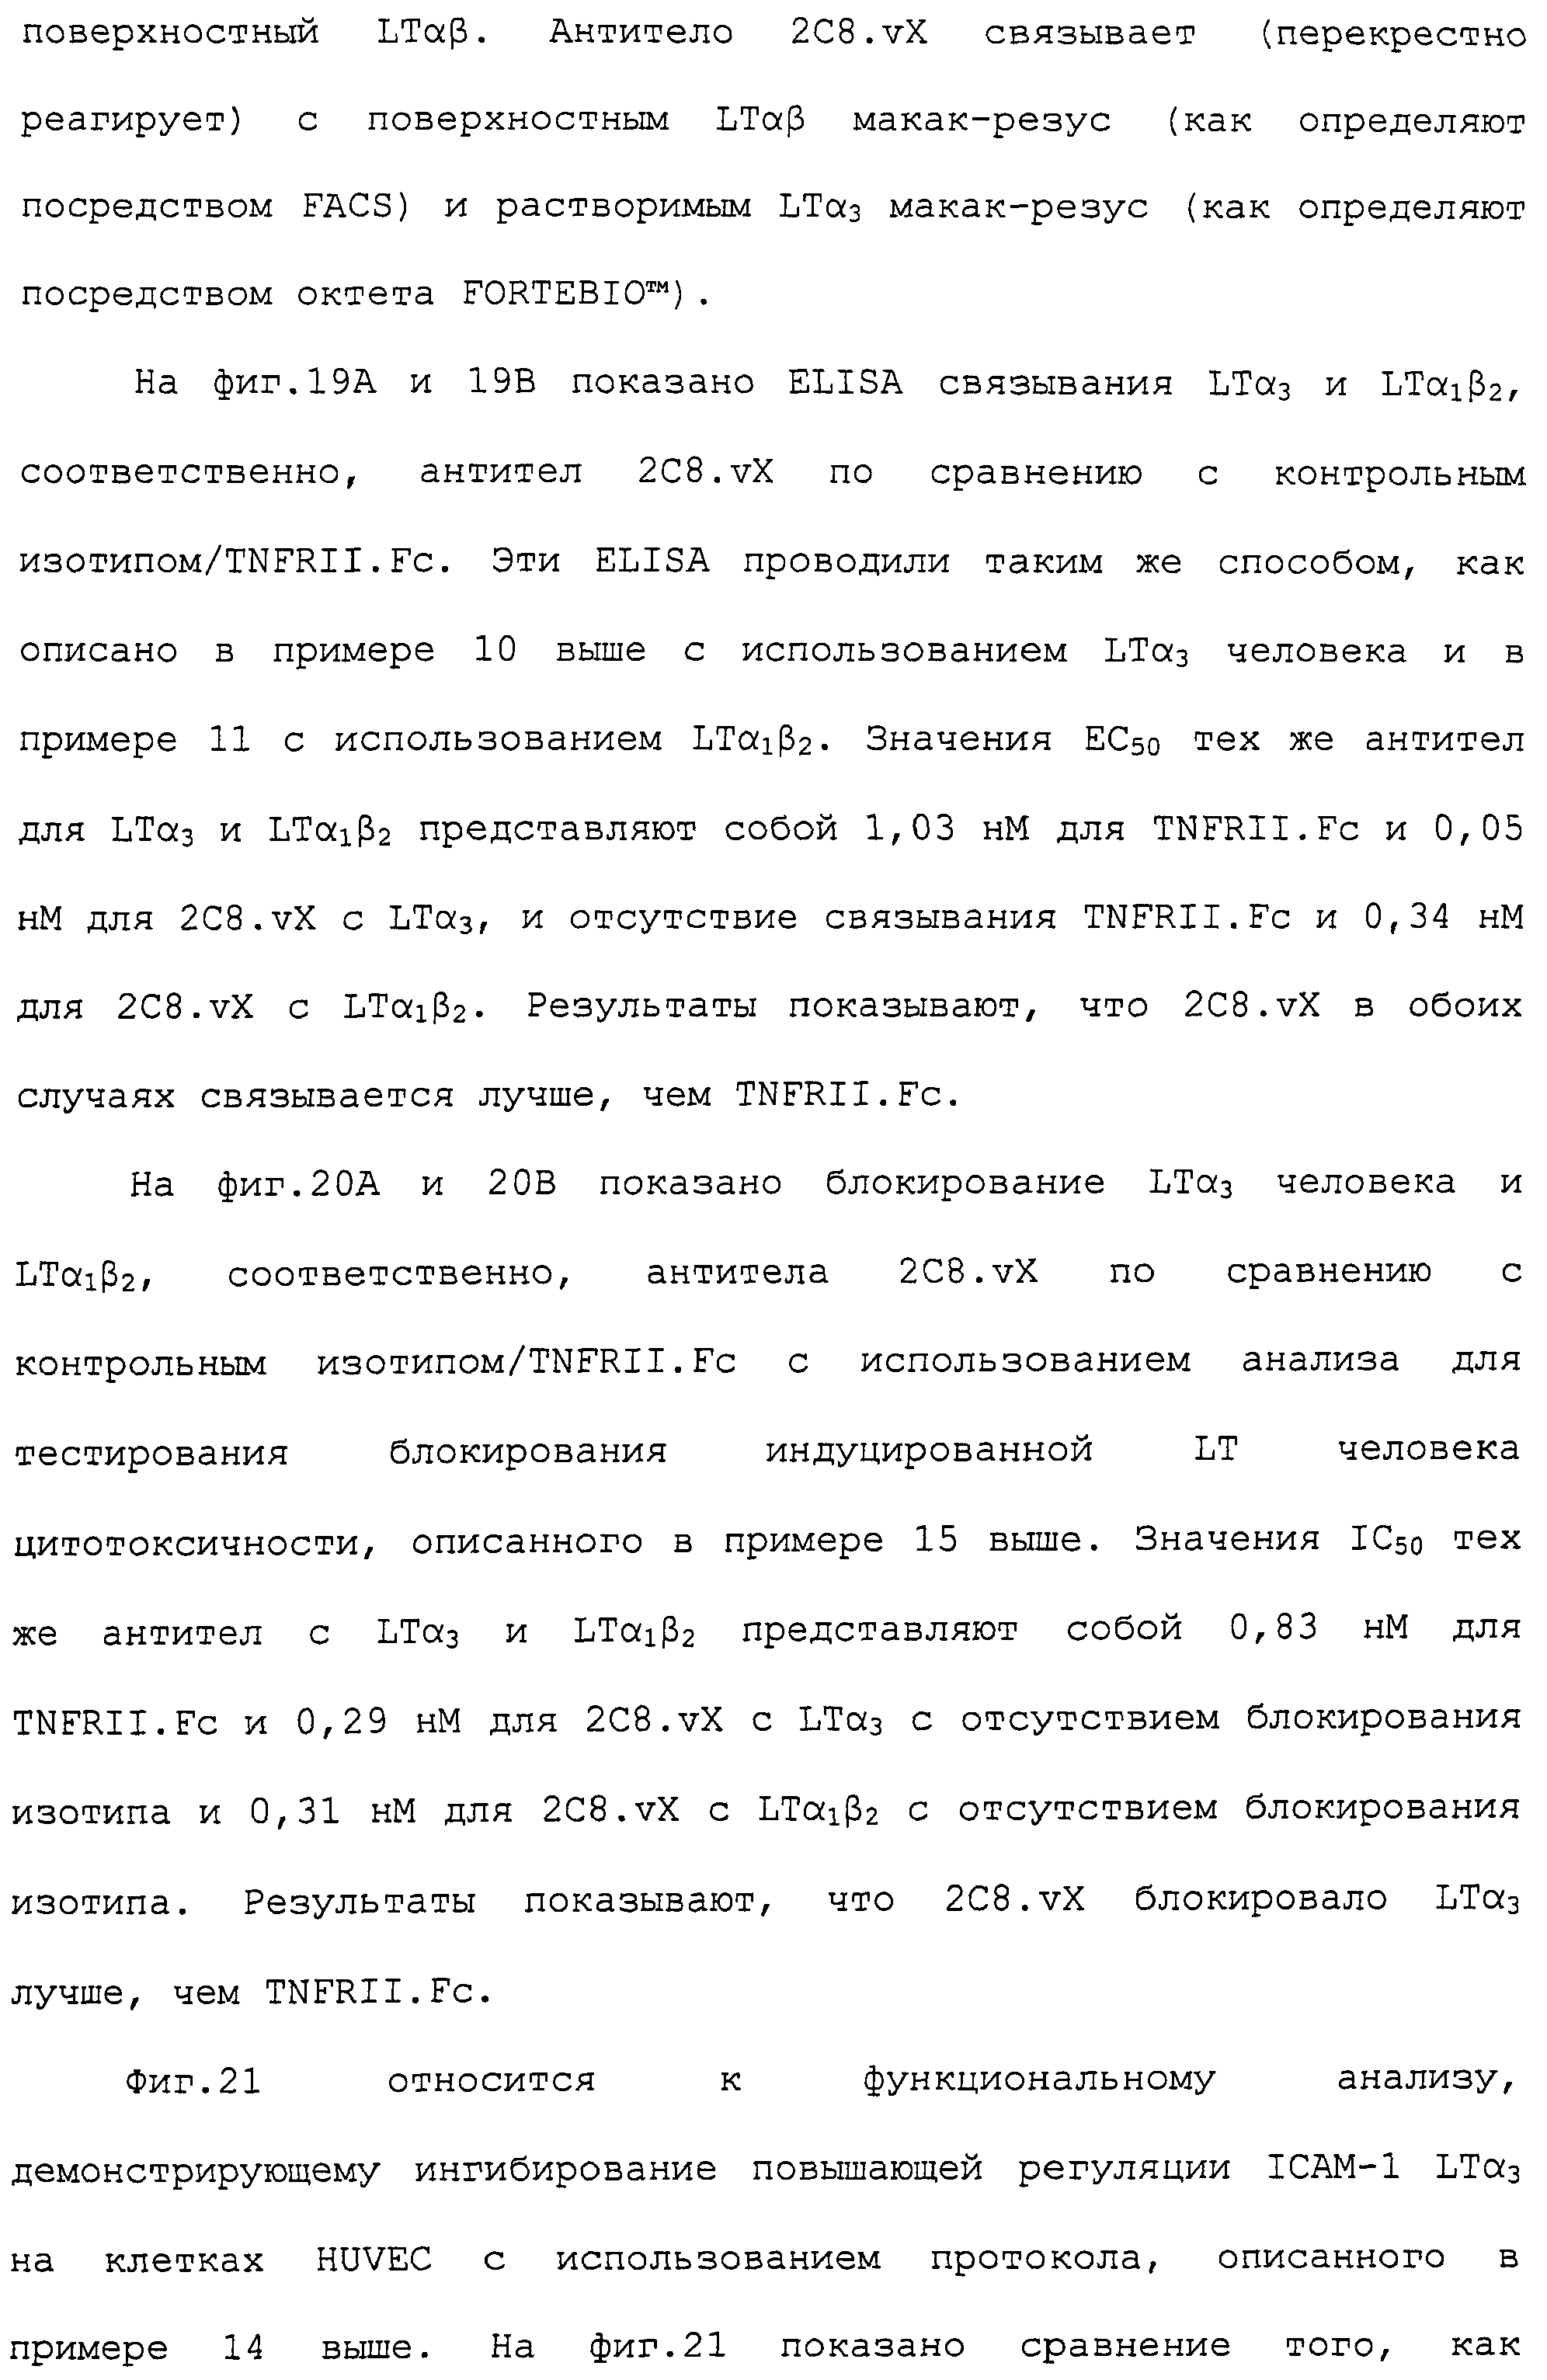 Figure 00000278